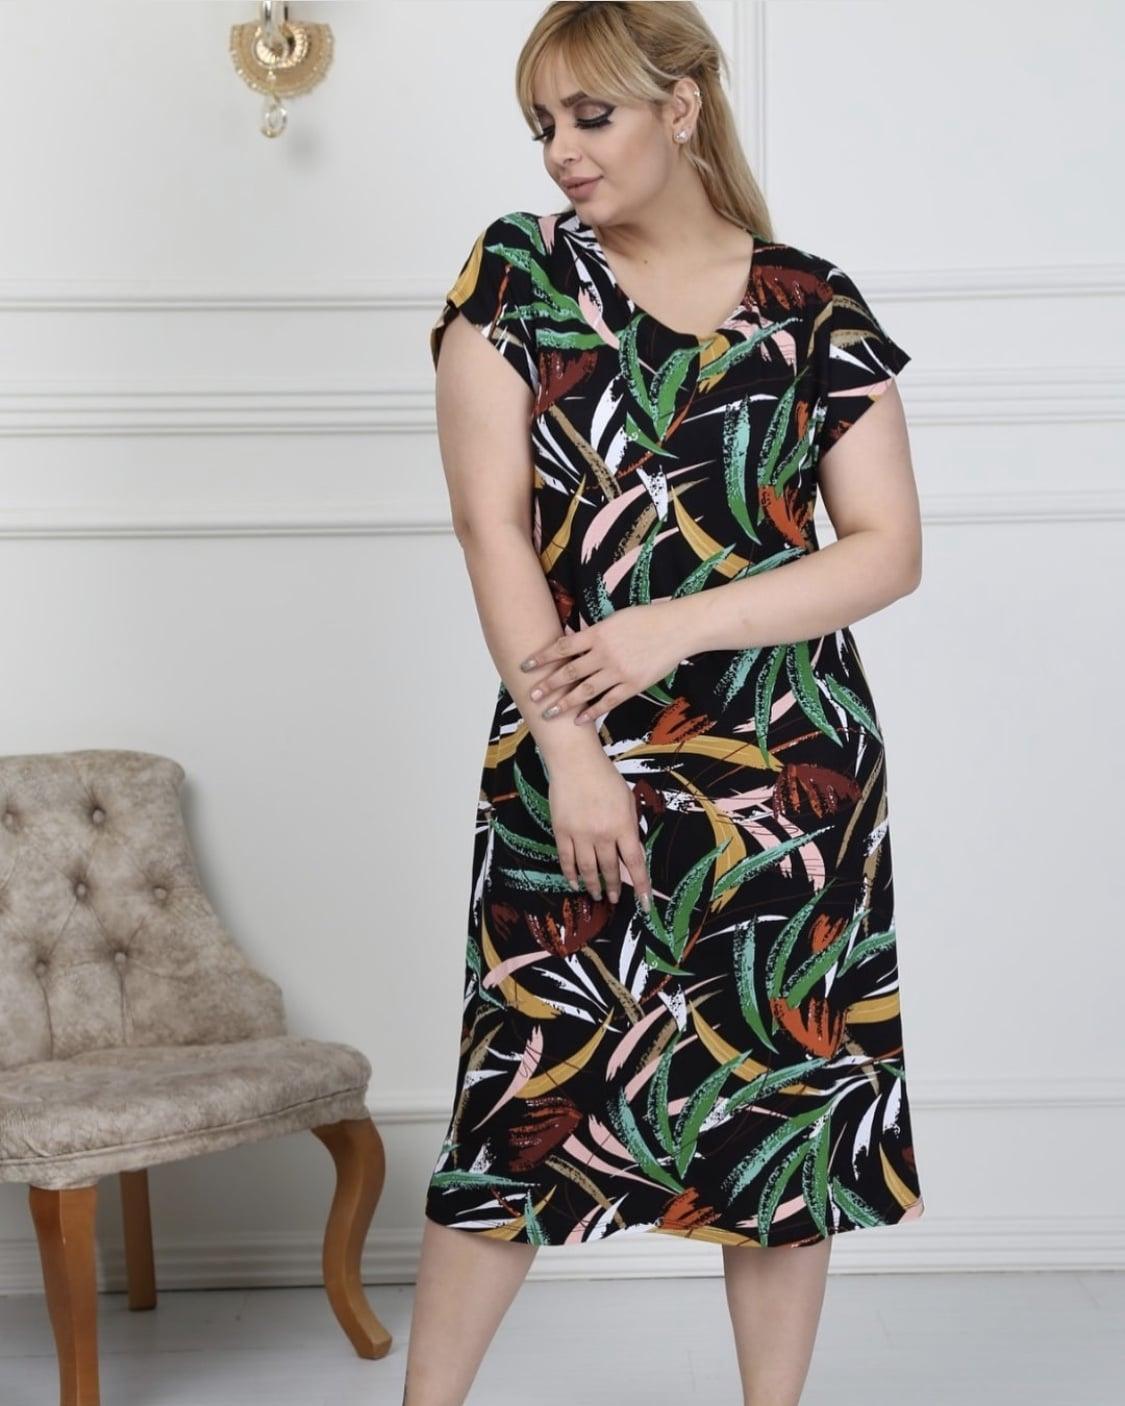 a58a82bff0b Tropical φόρεμα plus size κωδ 741-7-1 Fashionchoice